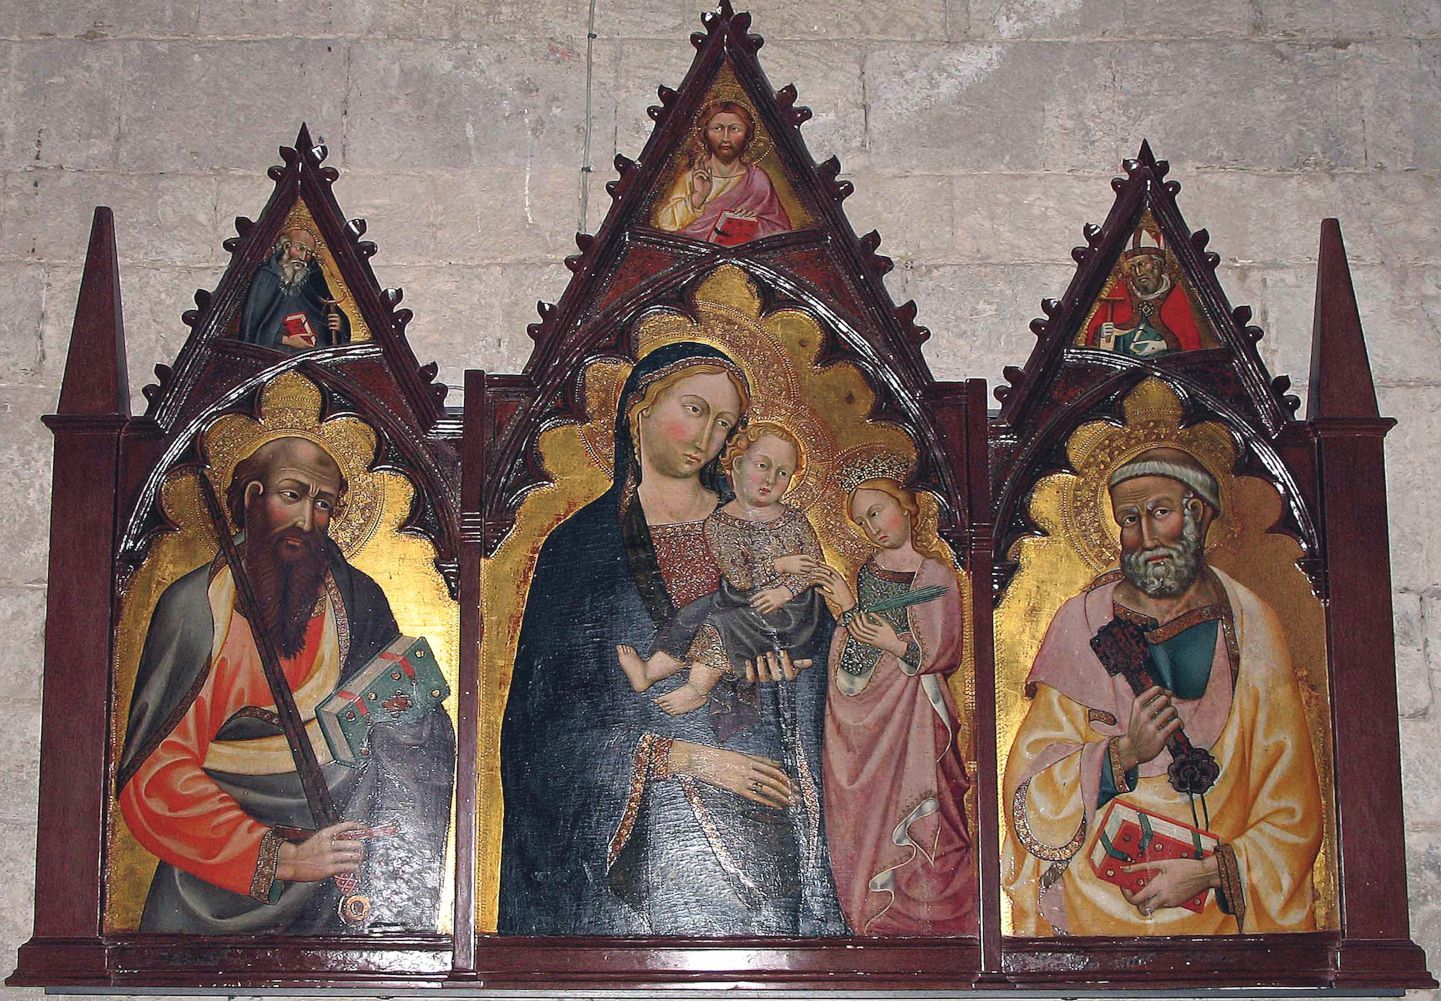 Triptych housed in the Pieve di San Leolino a Panzano